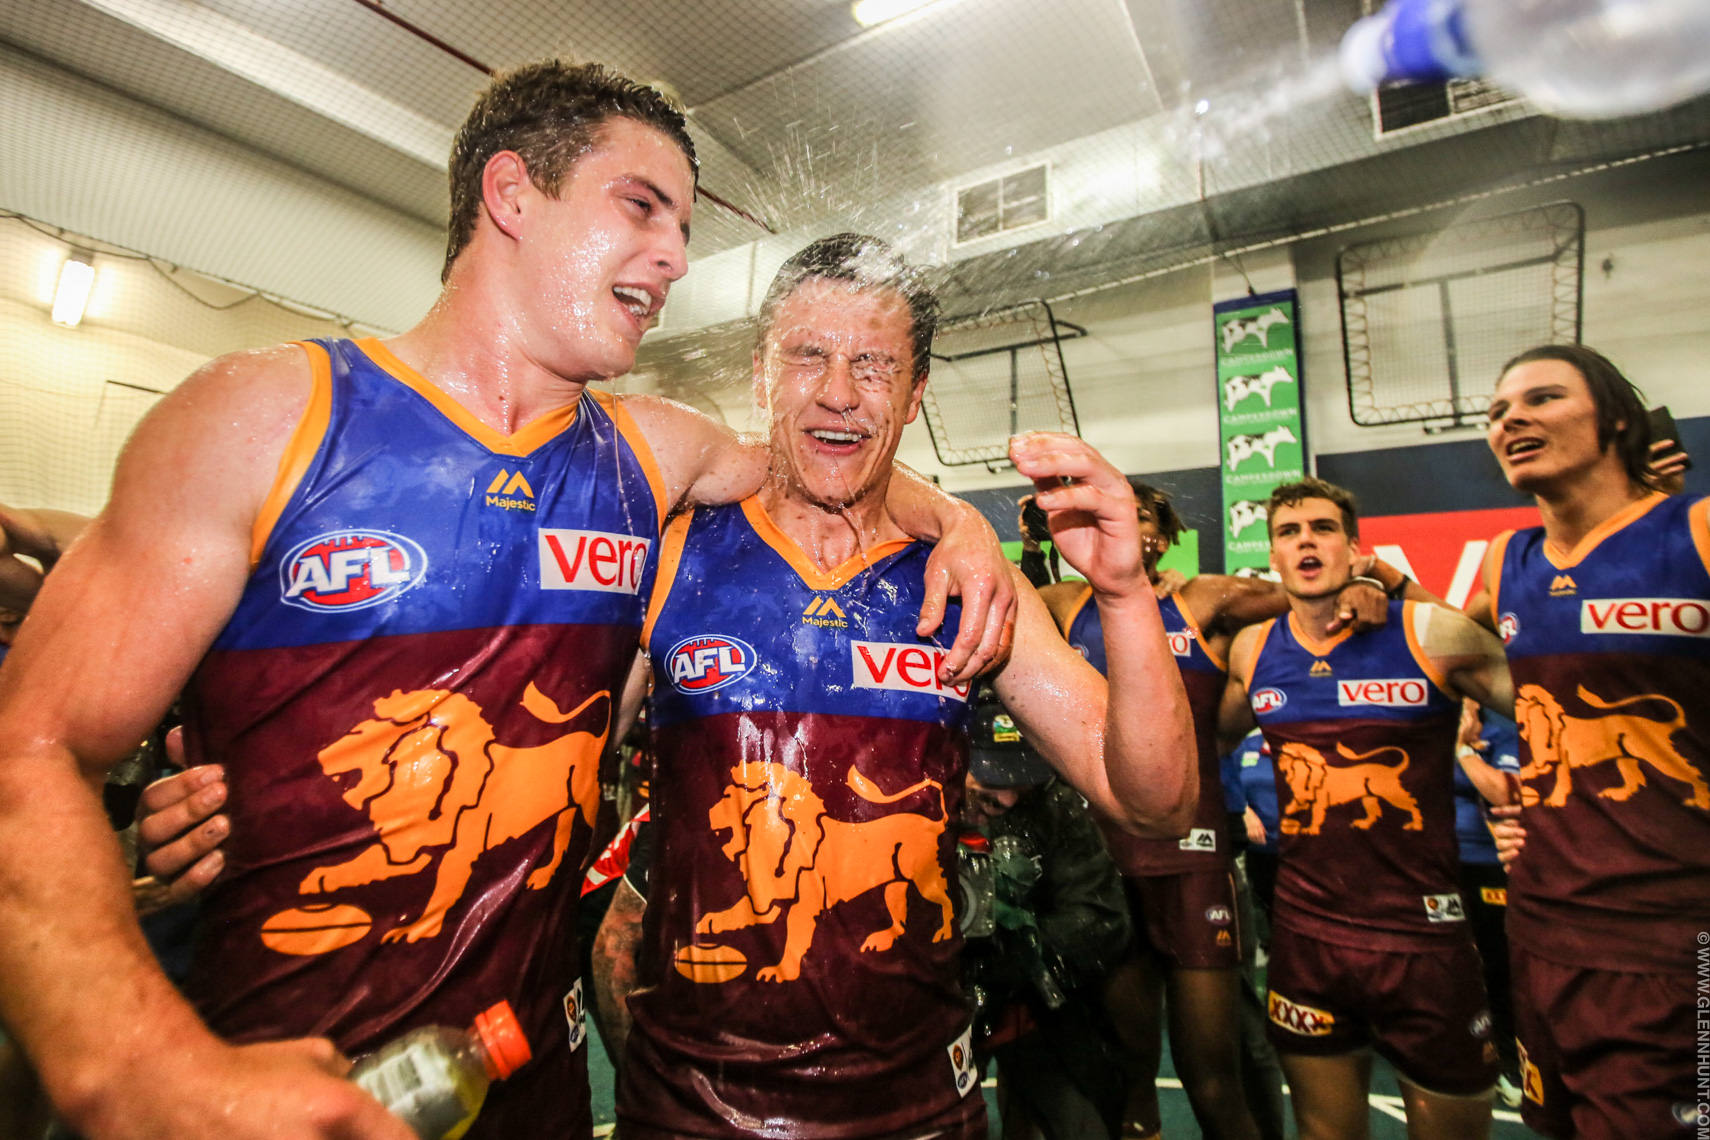 Brisbane Sports Photographer